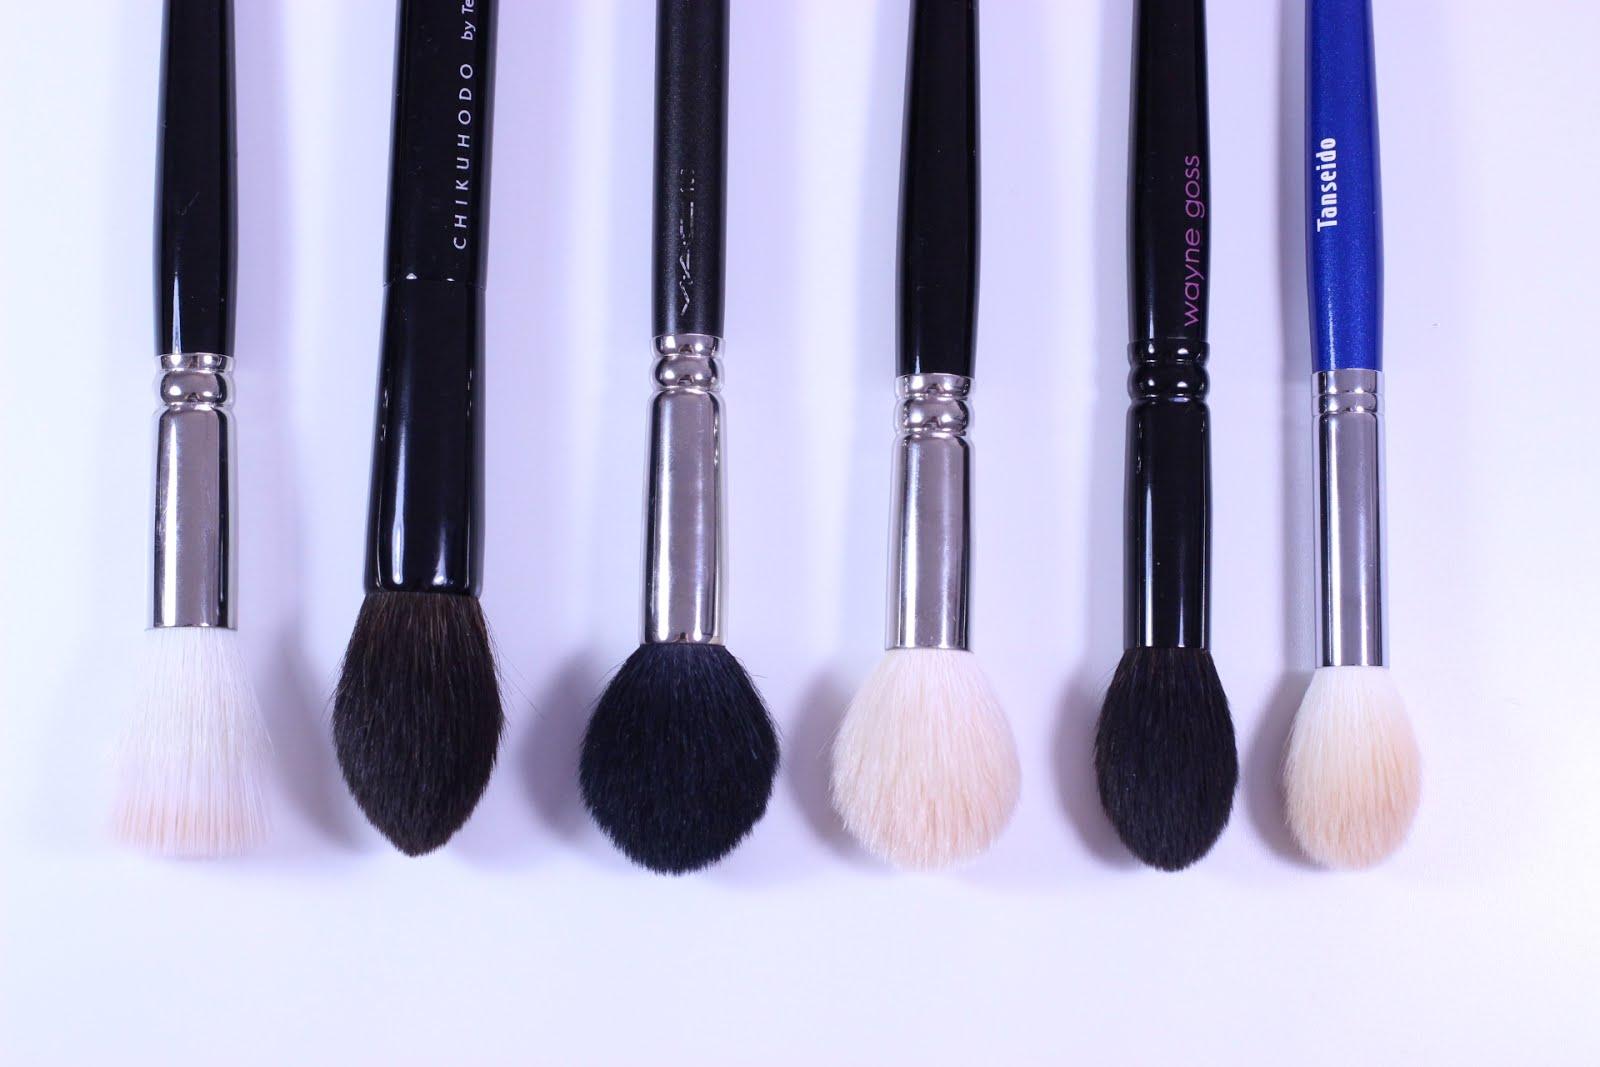 chikuhodo brushes. pat mcgrath 03 buffer brush, chikuhodo z-2, mac 165, hakuhodo j5521, g5521, wayne goss 02, tanseido ywc 14 brushes